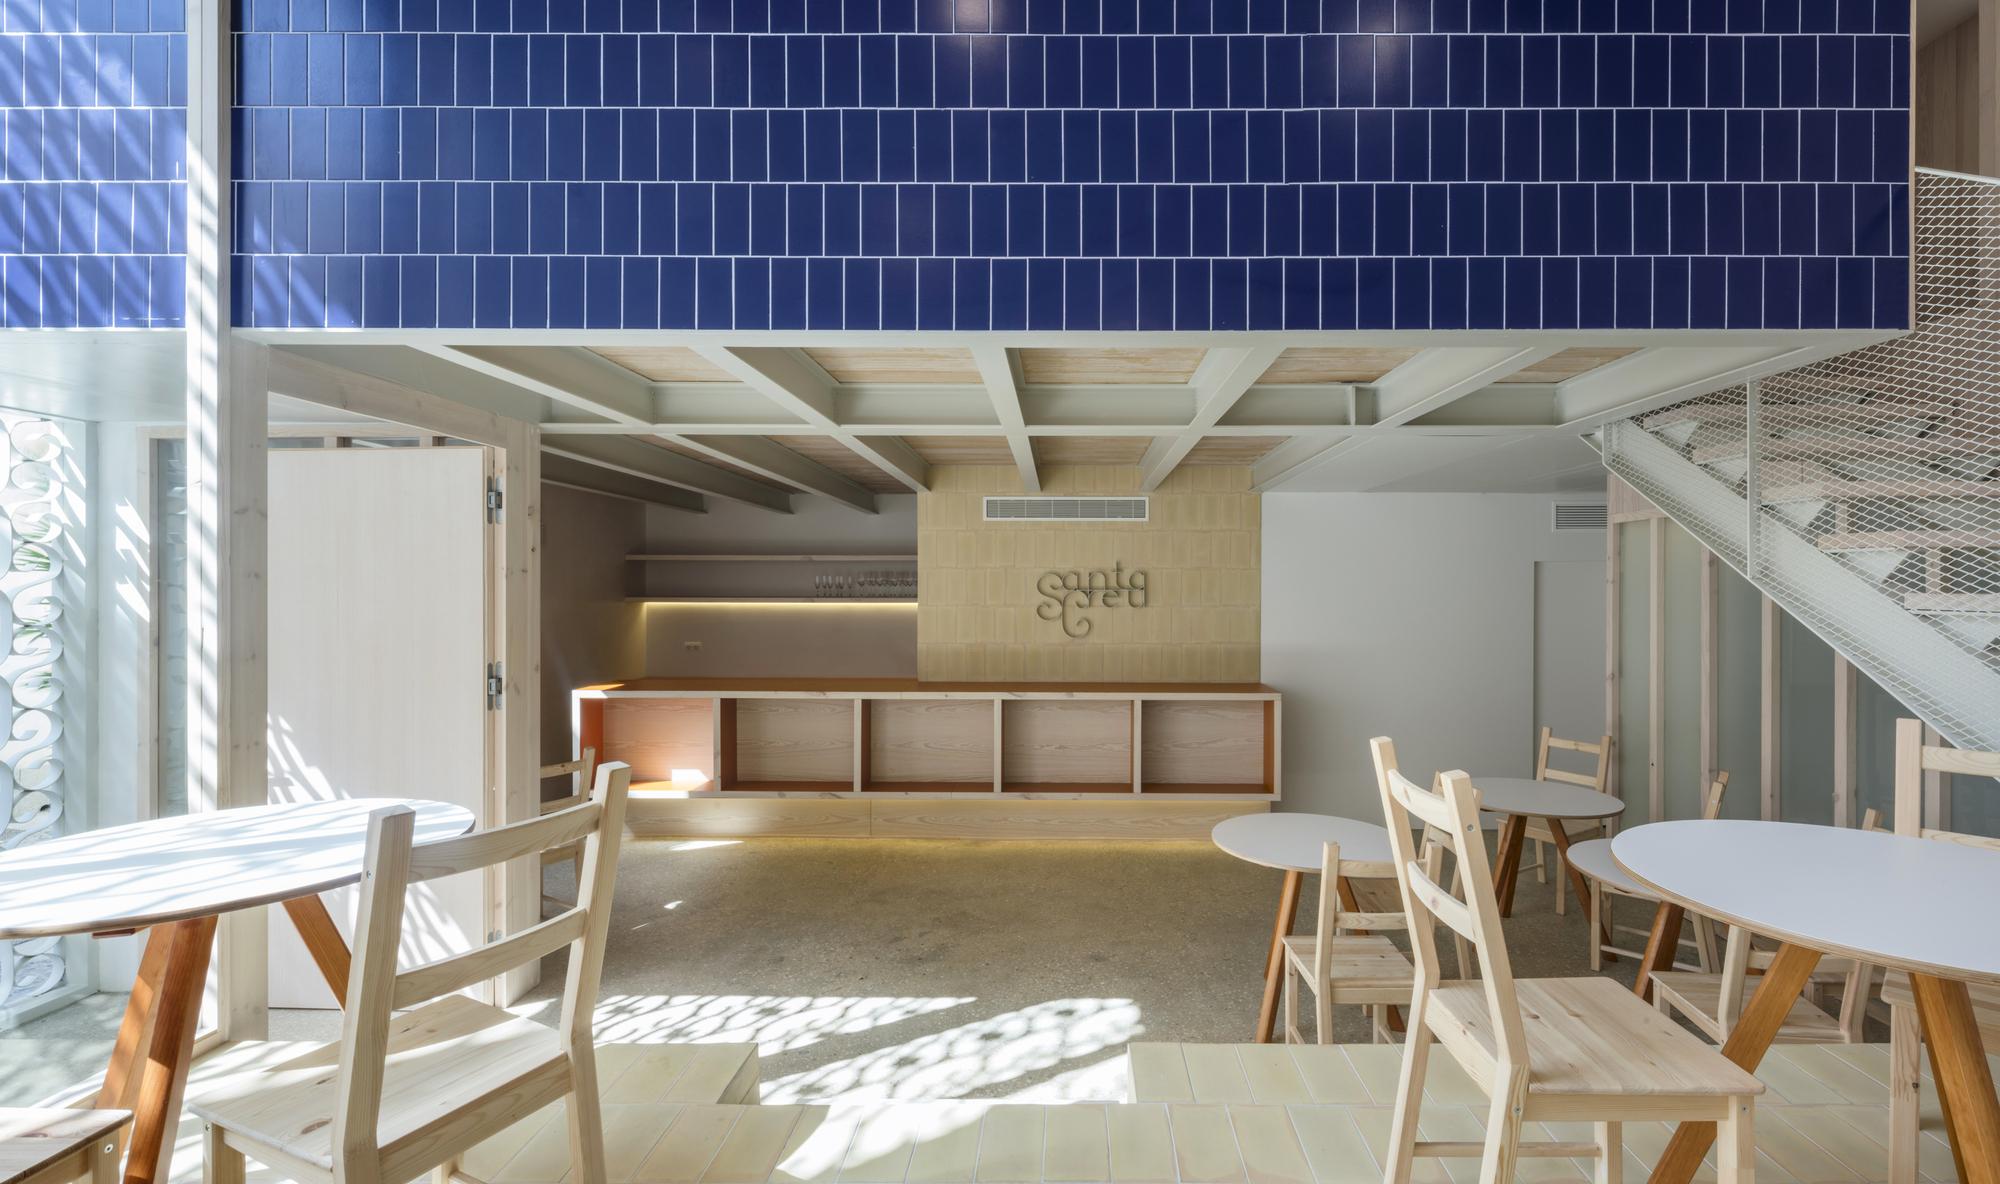 Gallery of SantaCreu Hotel in Tabarca Island / Diego López Fuster + Subarquitectura - 2